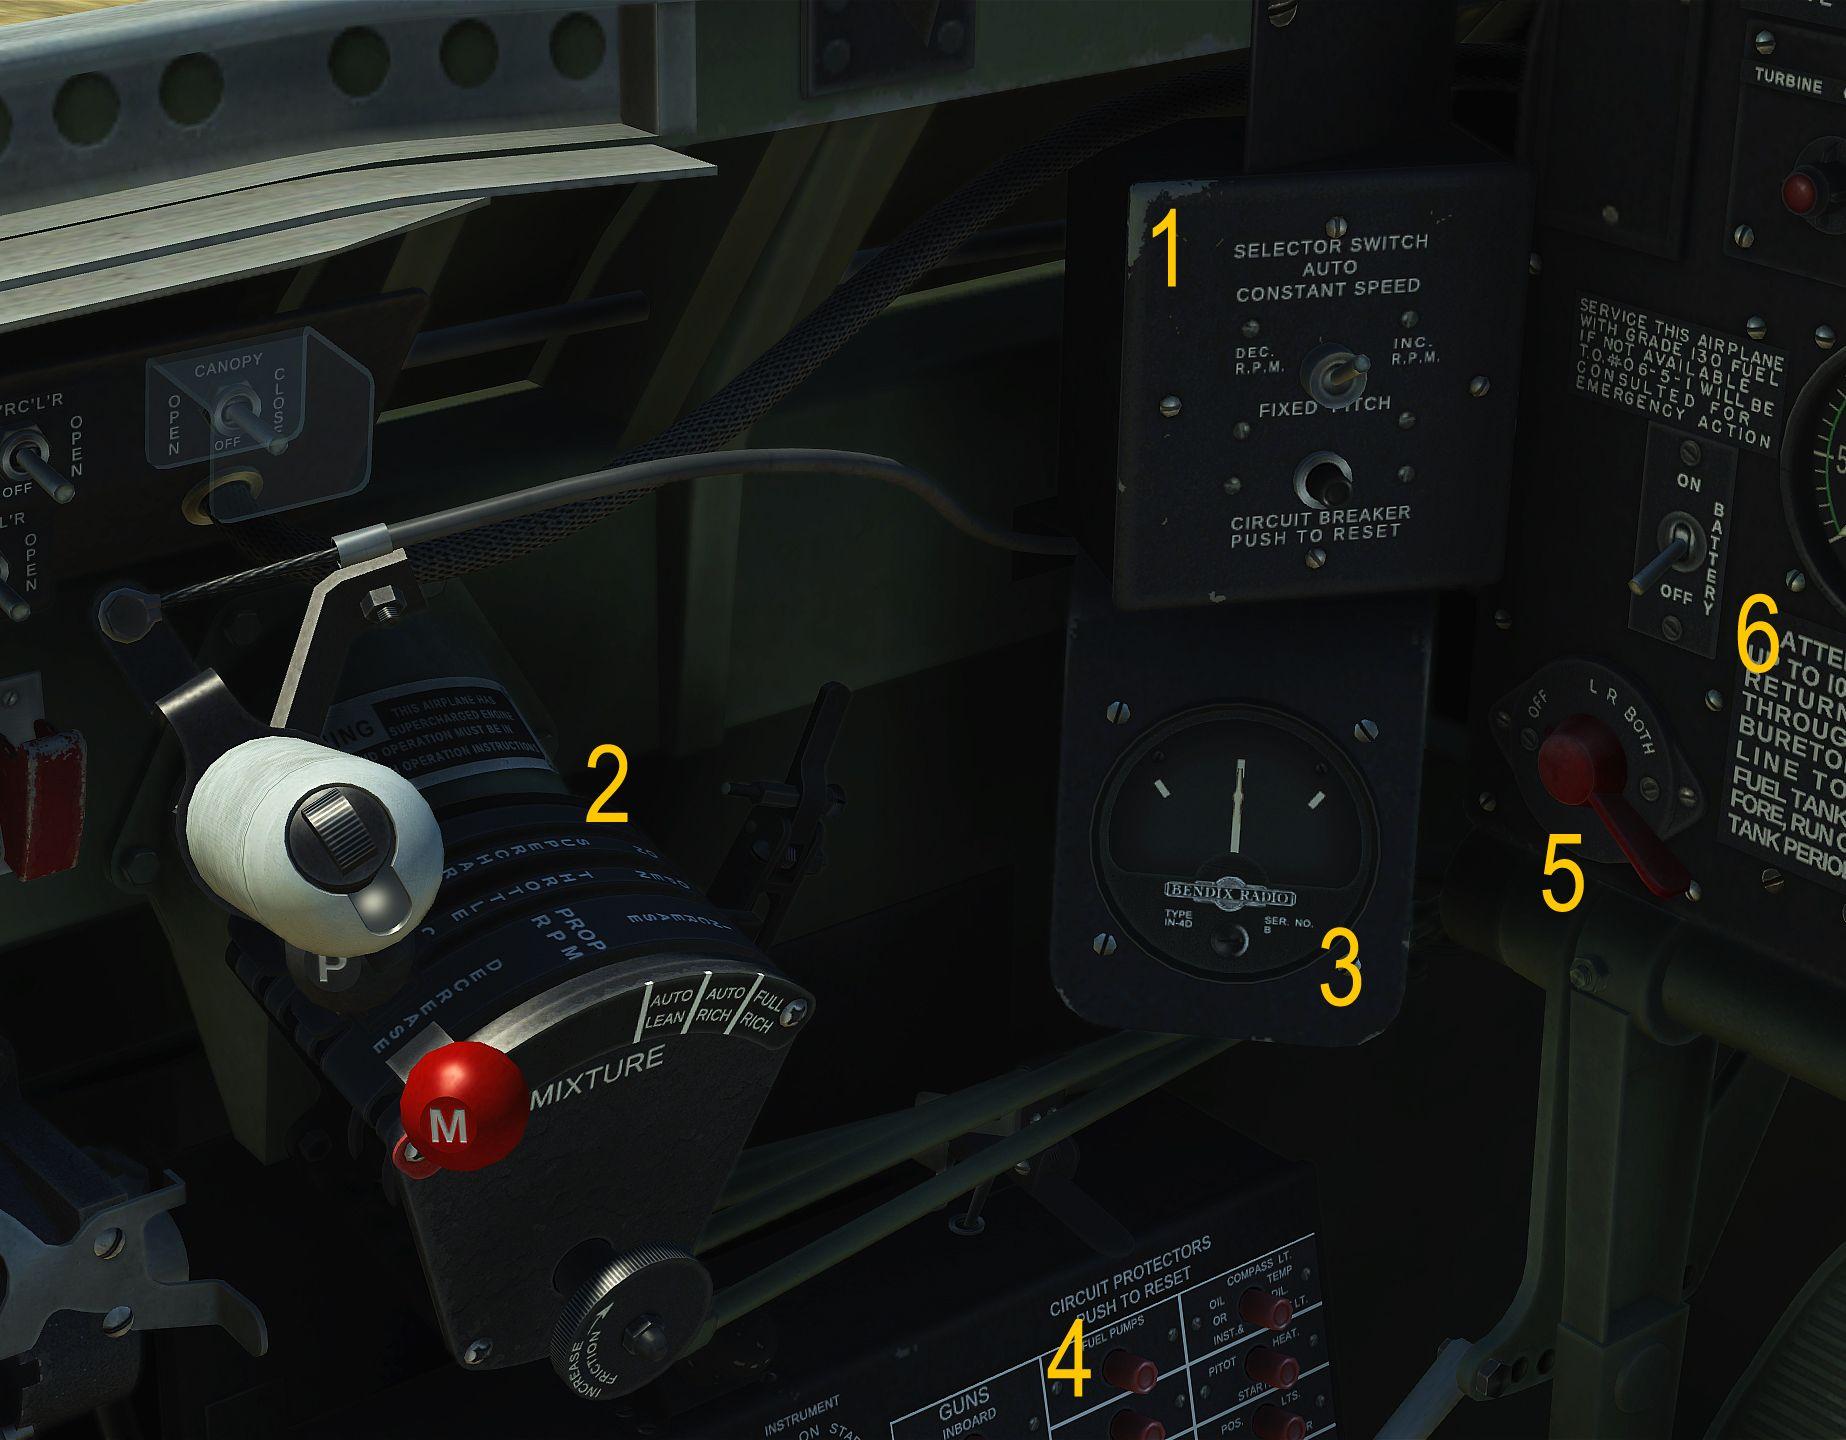 [FICHE] Republic P47-D-28-RE 5bdabfbe19ee3